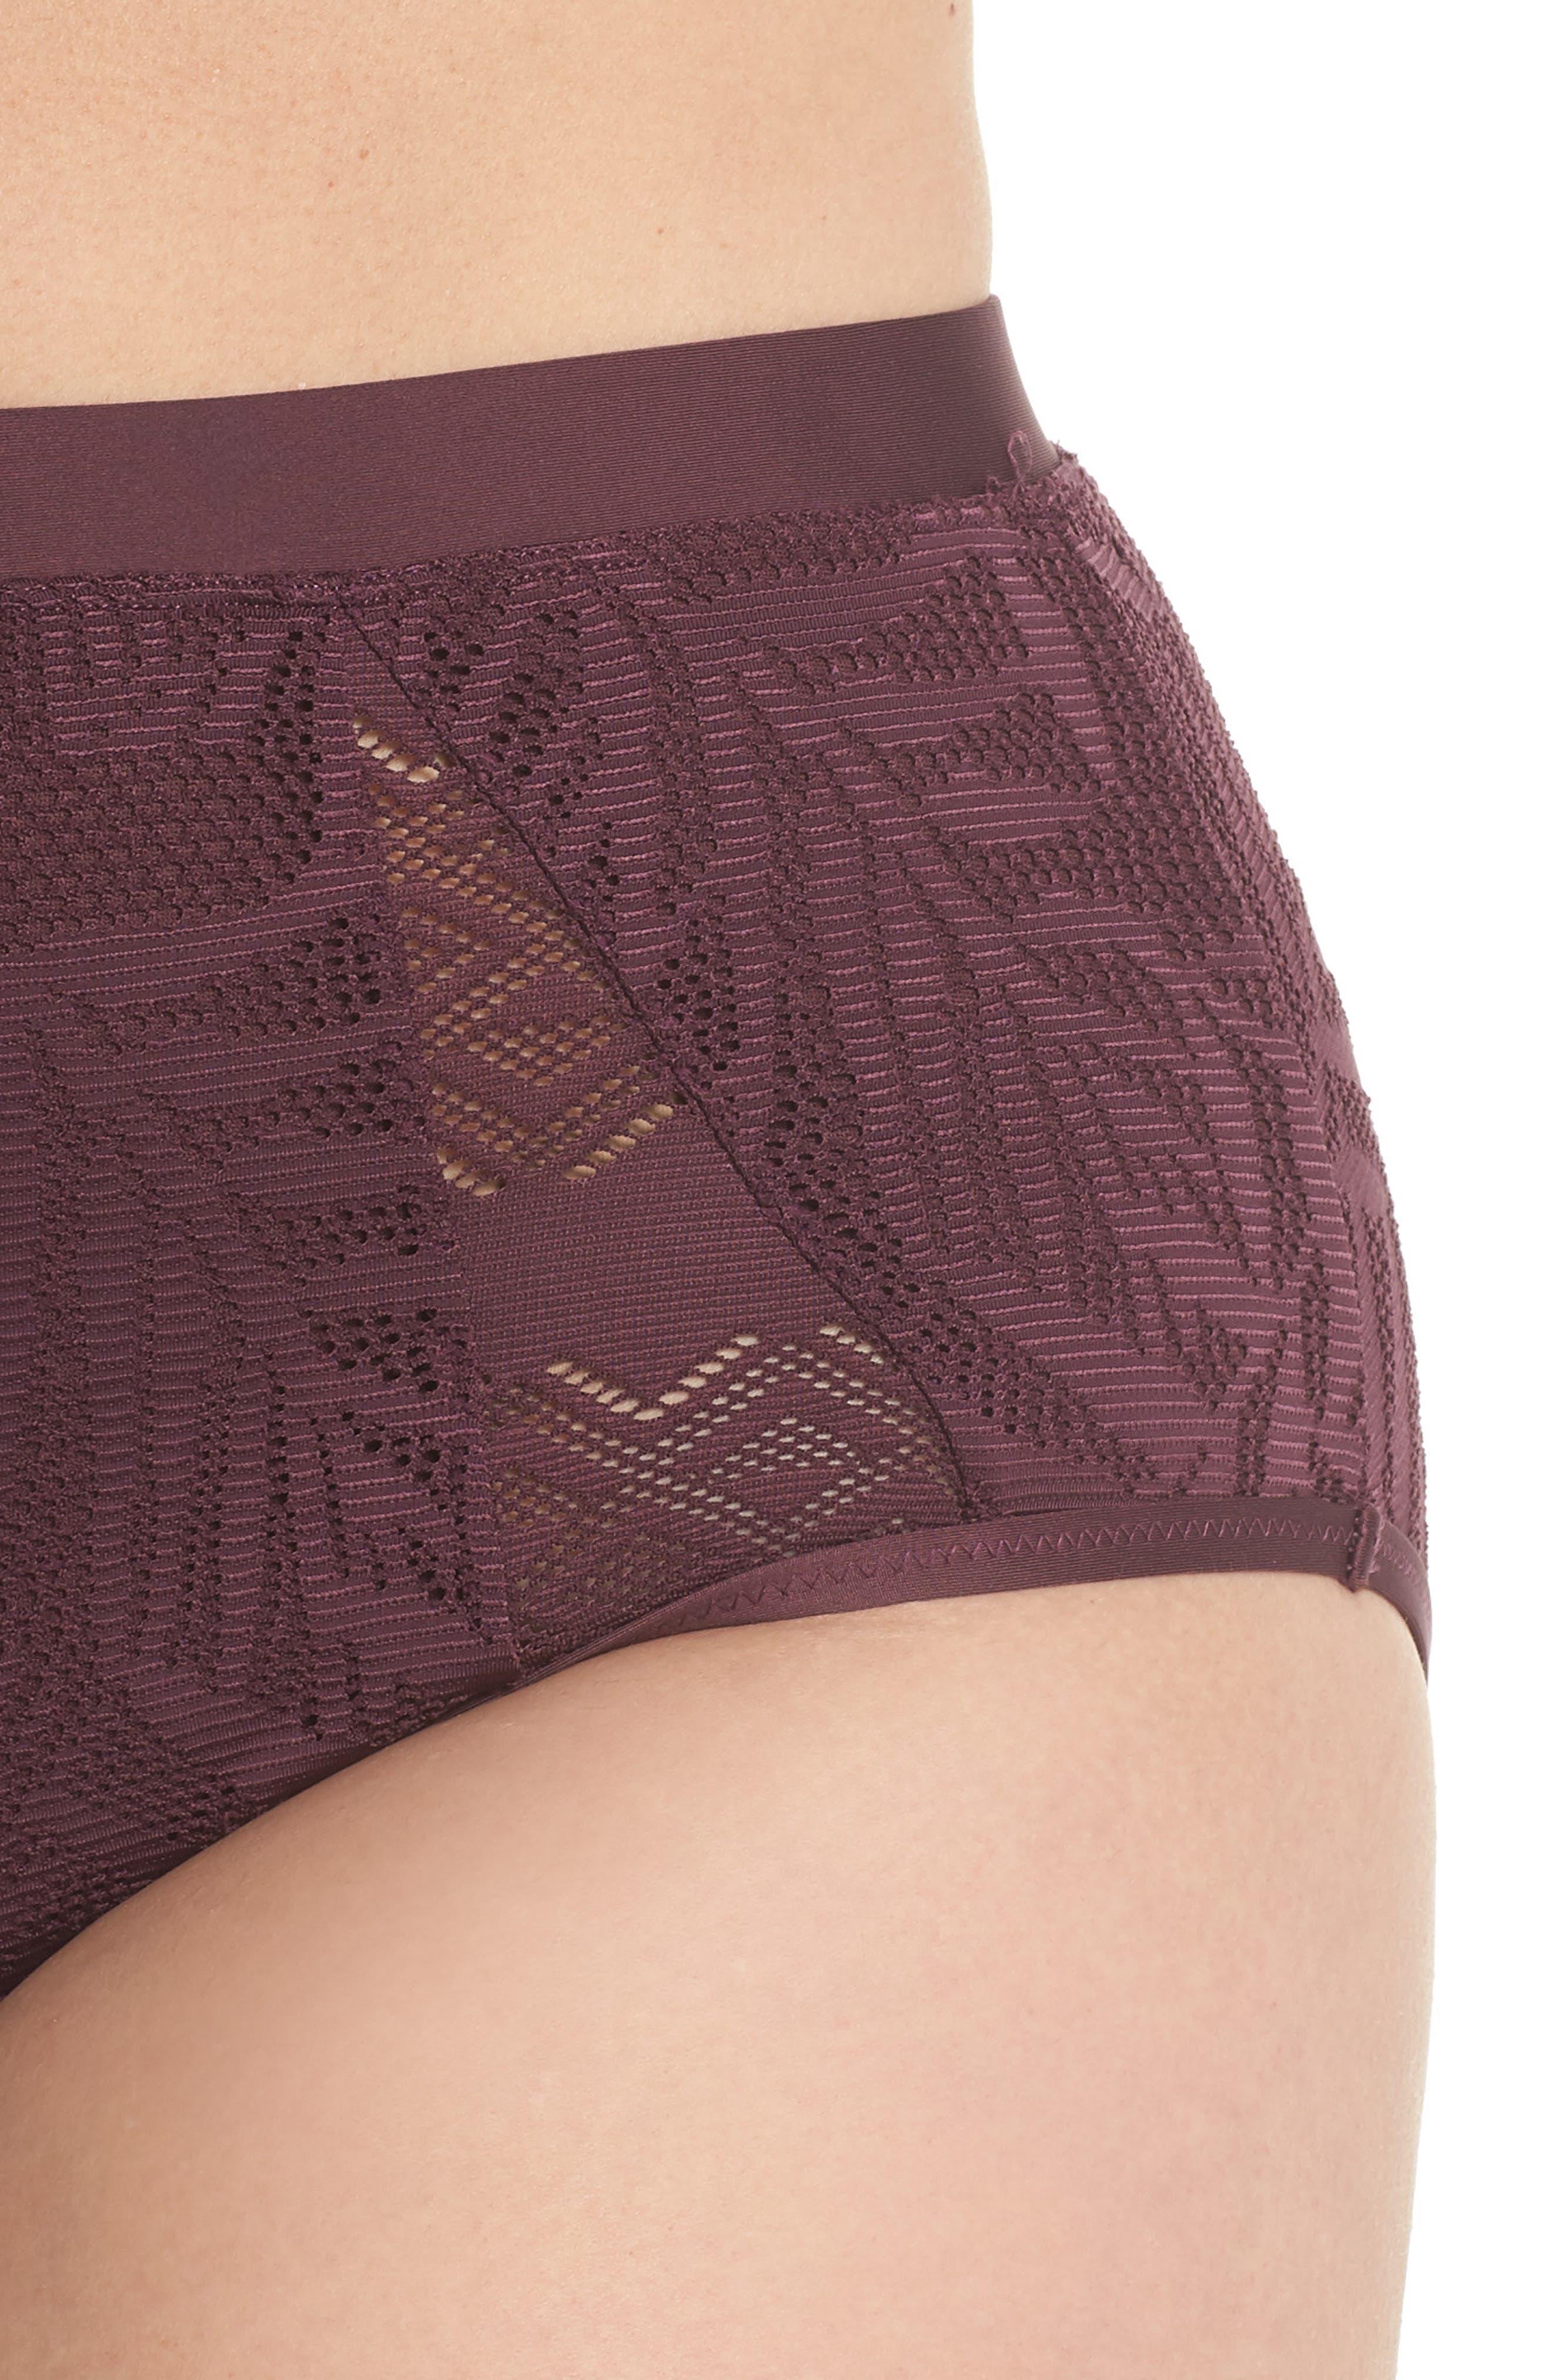 Crochet Inset High Waist Bikini Bottoms,                             Alternate thumbnail 4, color,                             930